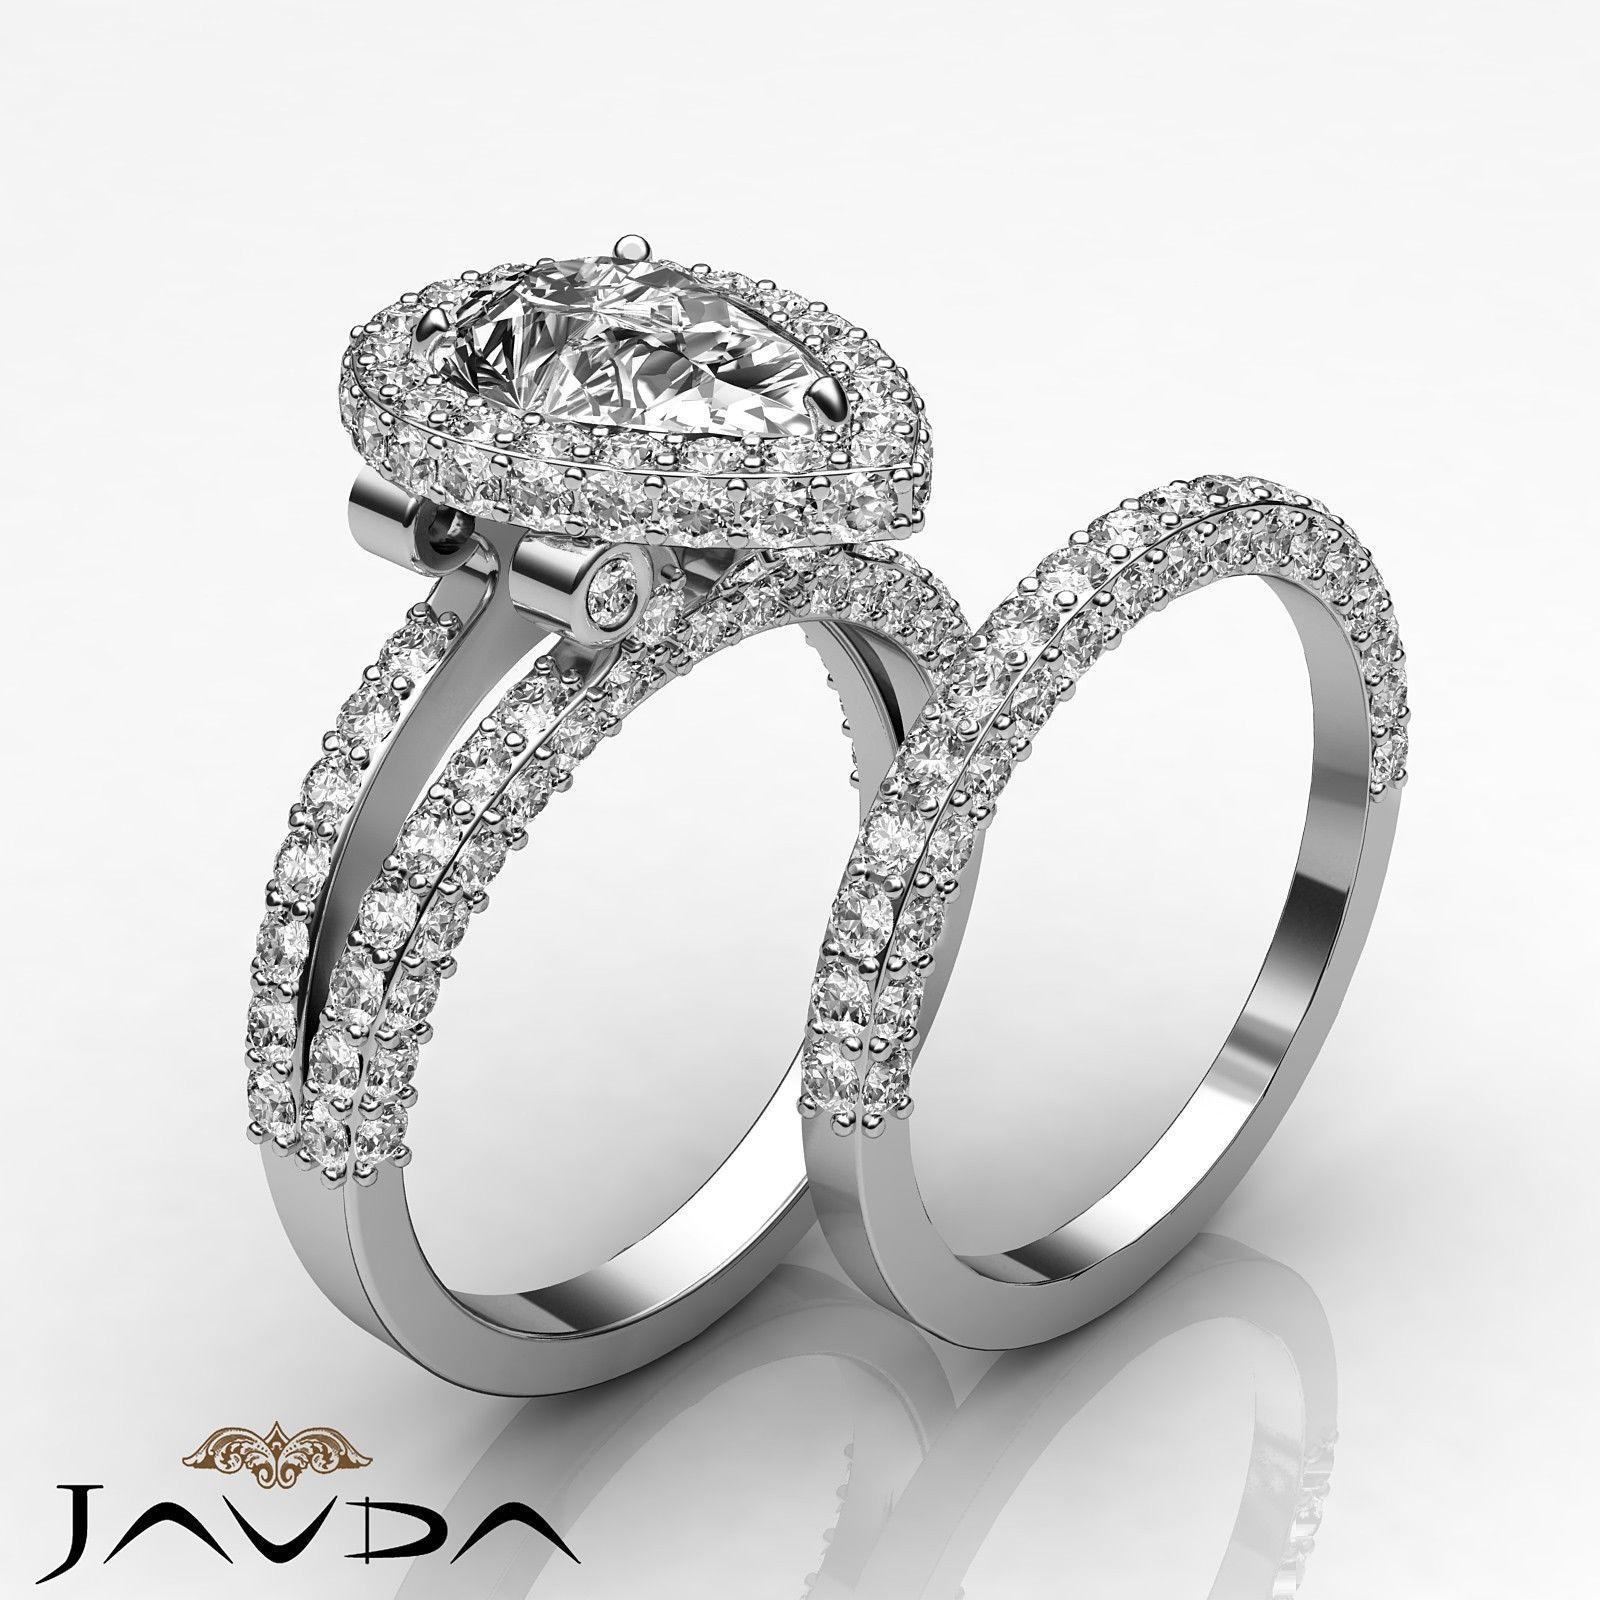 Bridal Set Pear Diamond Vintage Pave Engagement Ring GIA H VS2 Platinum 3 72 Ct | eBay